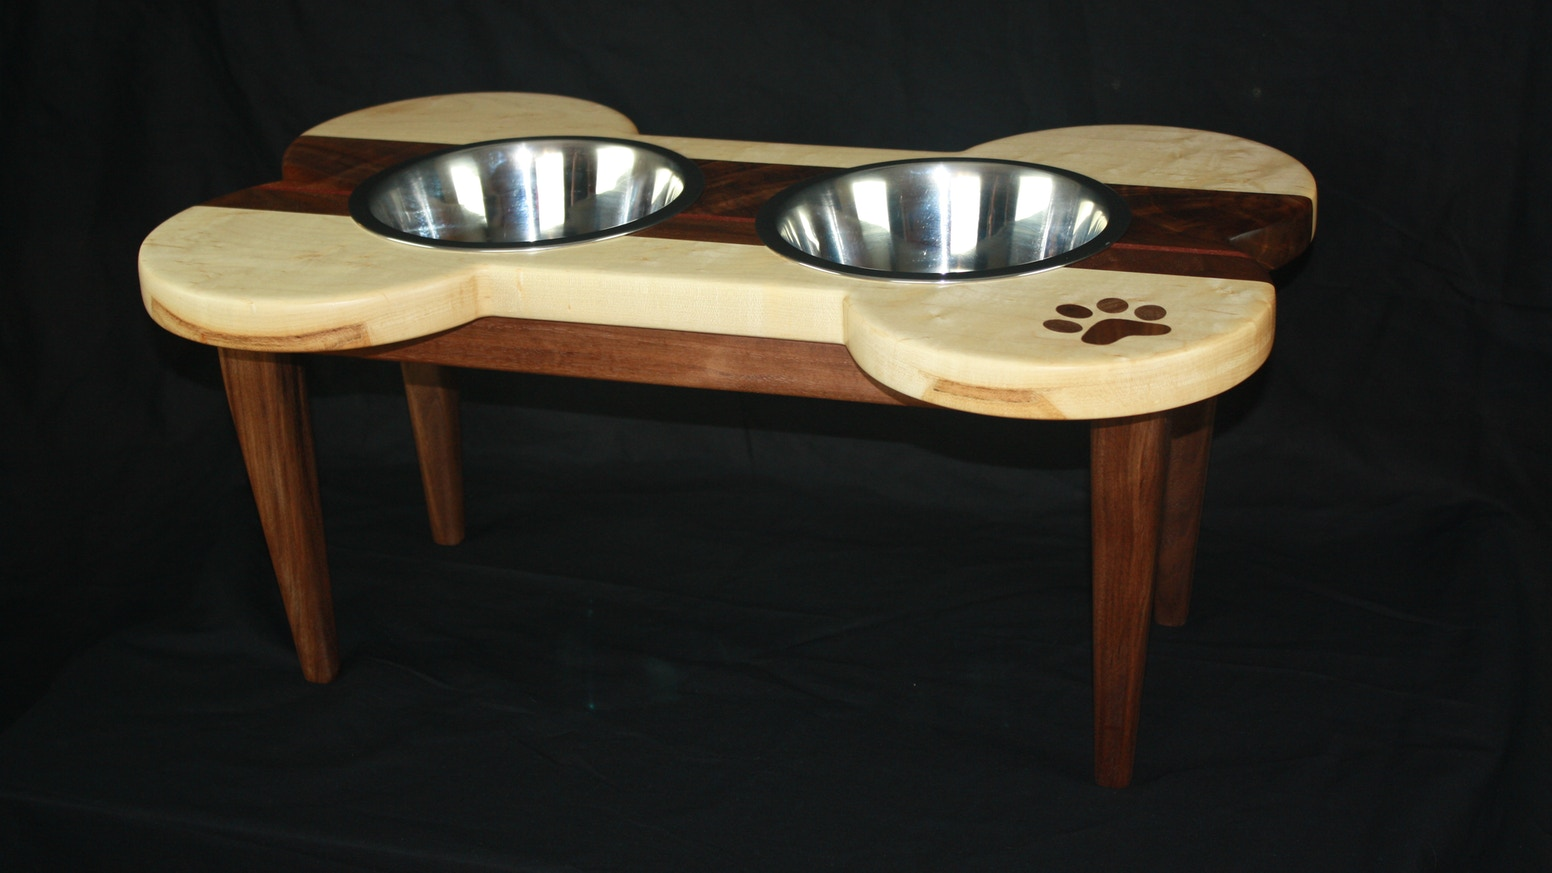 Fine Handmade Wood Cat Dog Dining Tables